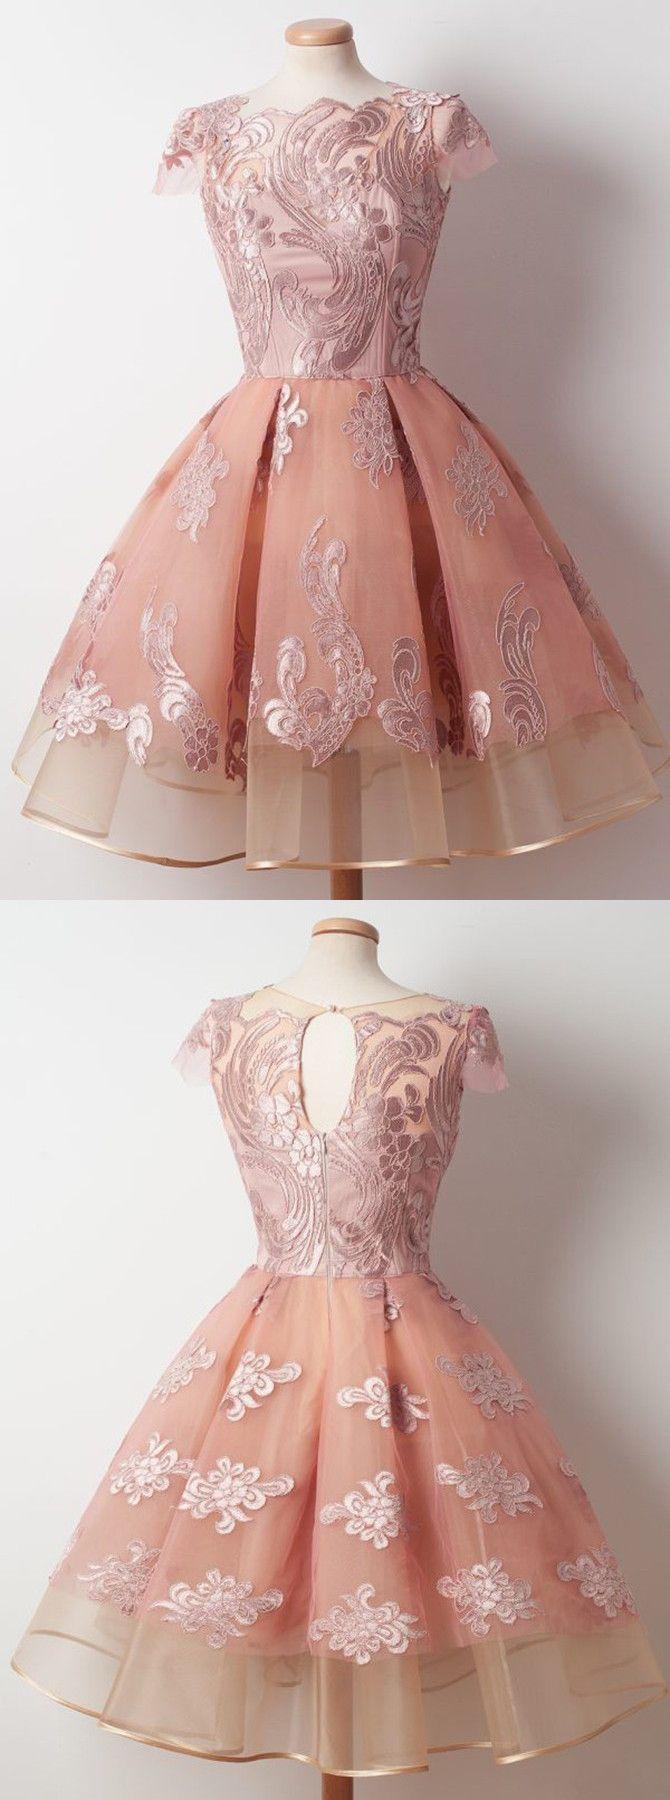 2017 homecoming dresses,short homecoming dresses,pink homecoming dresses,lace homecoming dresses